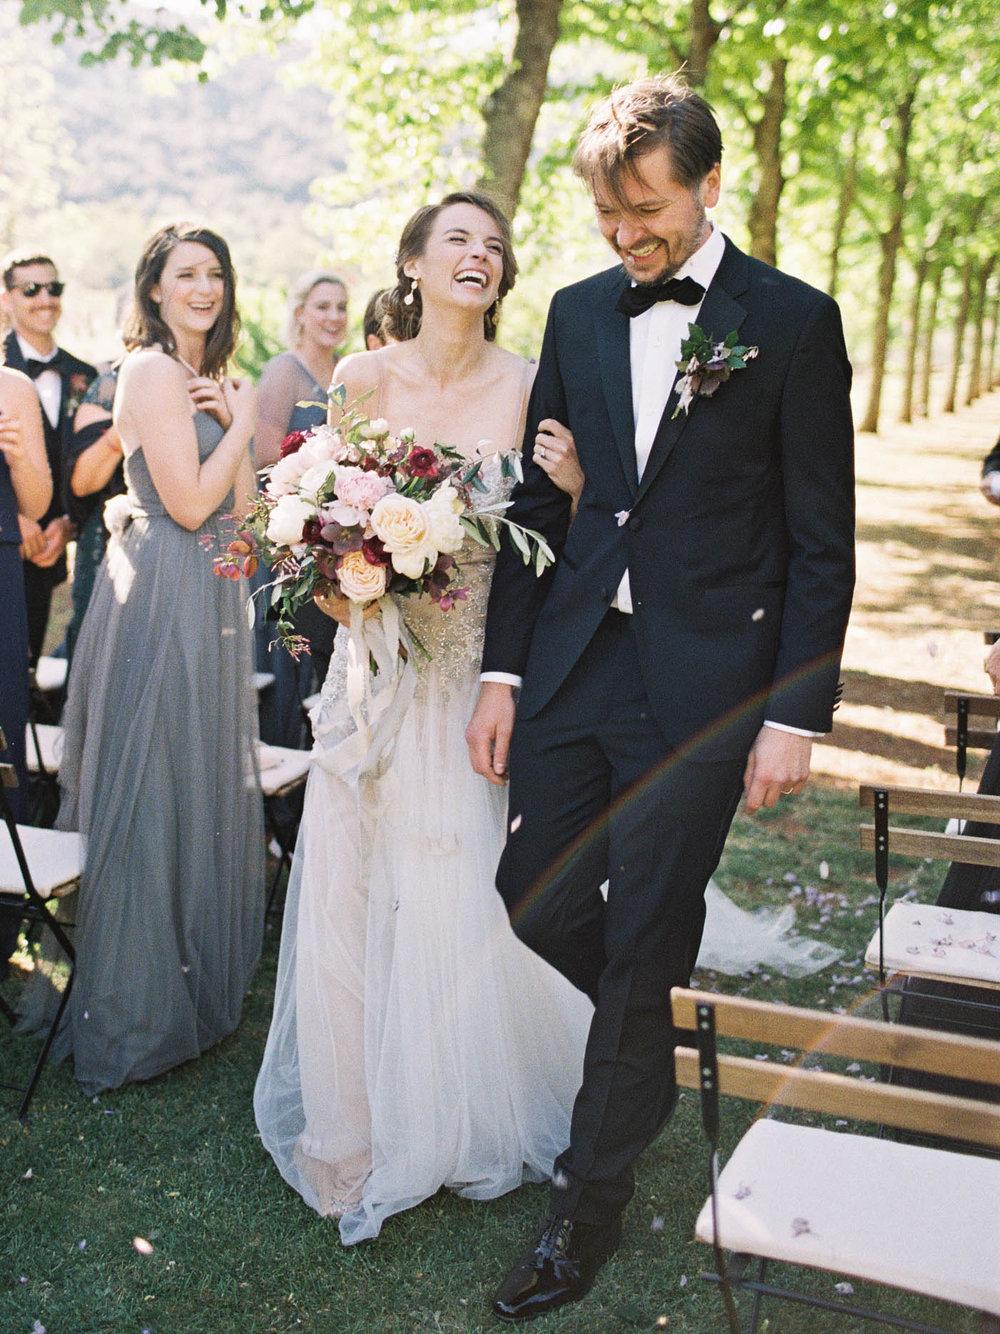 Villa_Cetinale_Wedding-34-Jen_Huang-ElanJacob-241-Jen_Huang-007297-R1-030.jpg